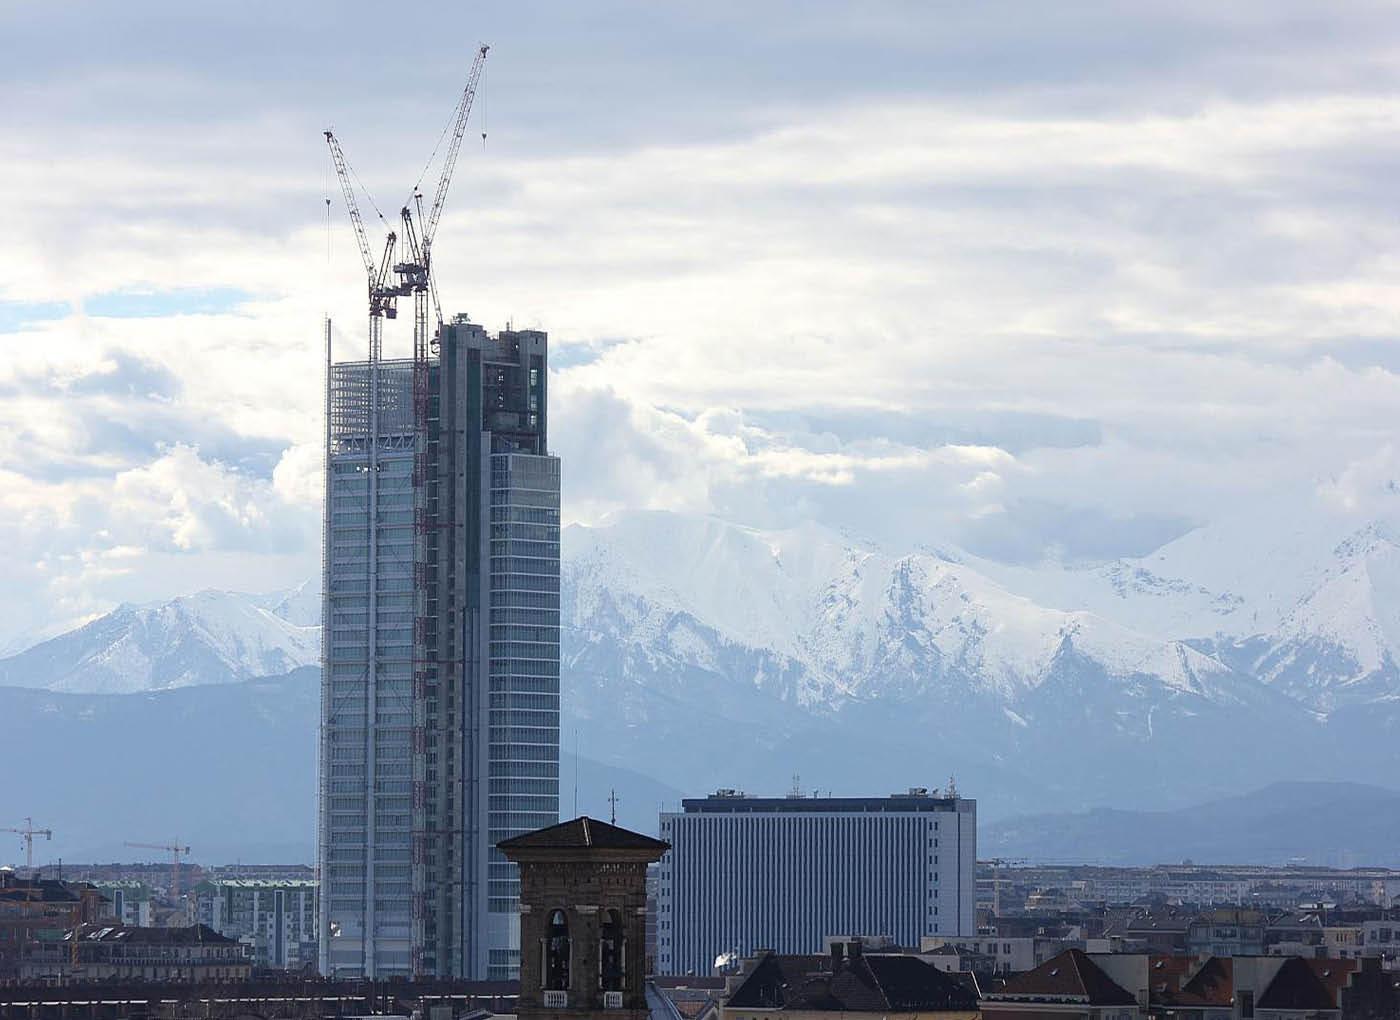 Grattacielo Intesa Sanpaolo, Torino